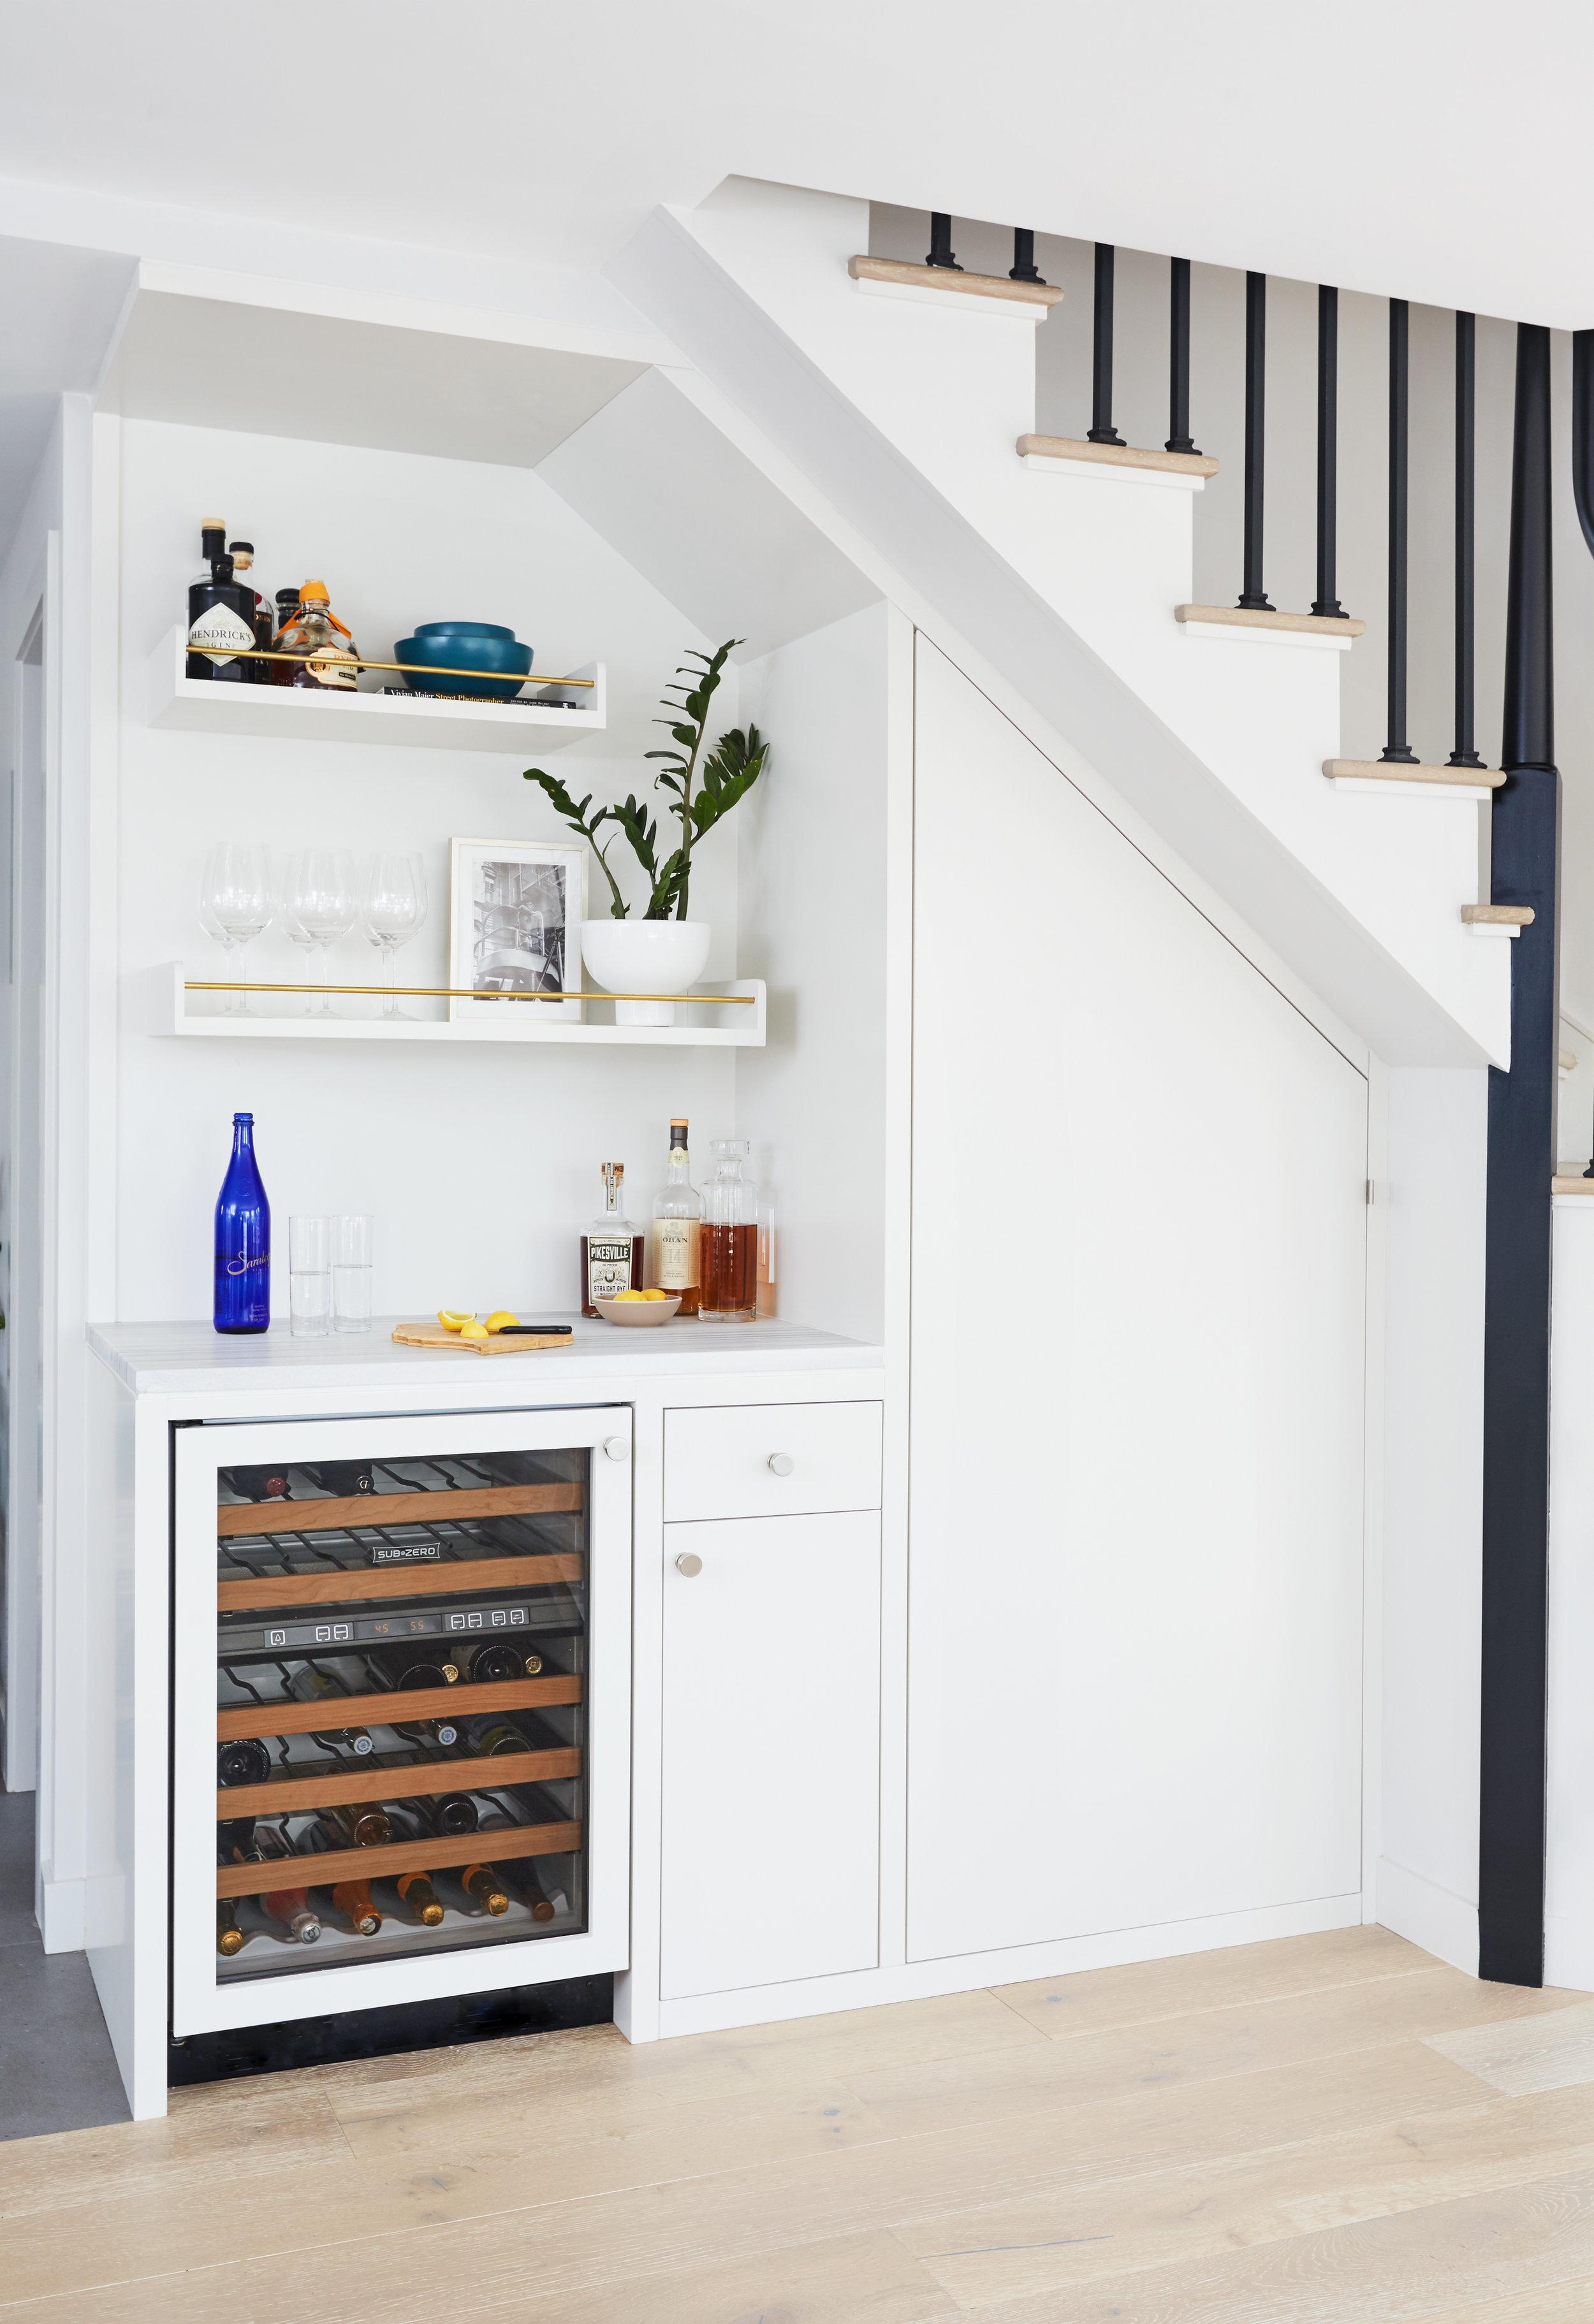 101-duplex-penthouse-kitchen-bar-renovation